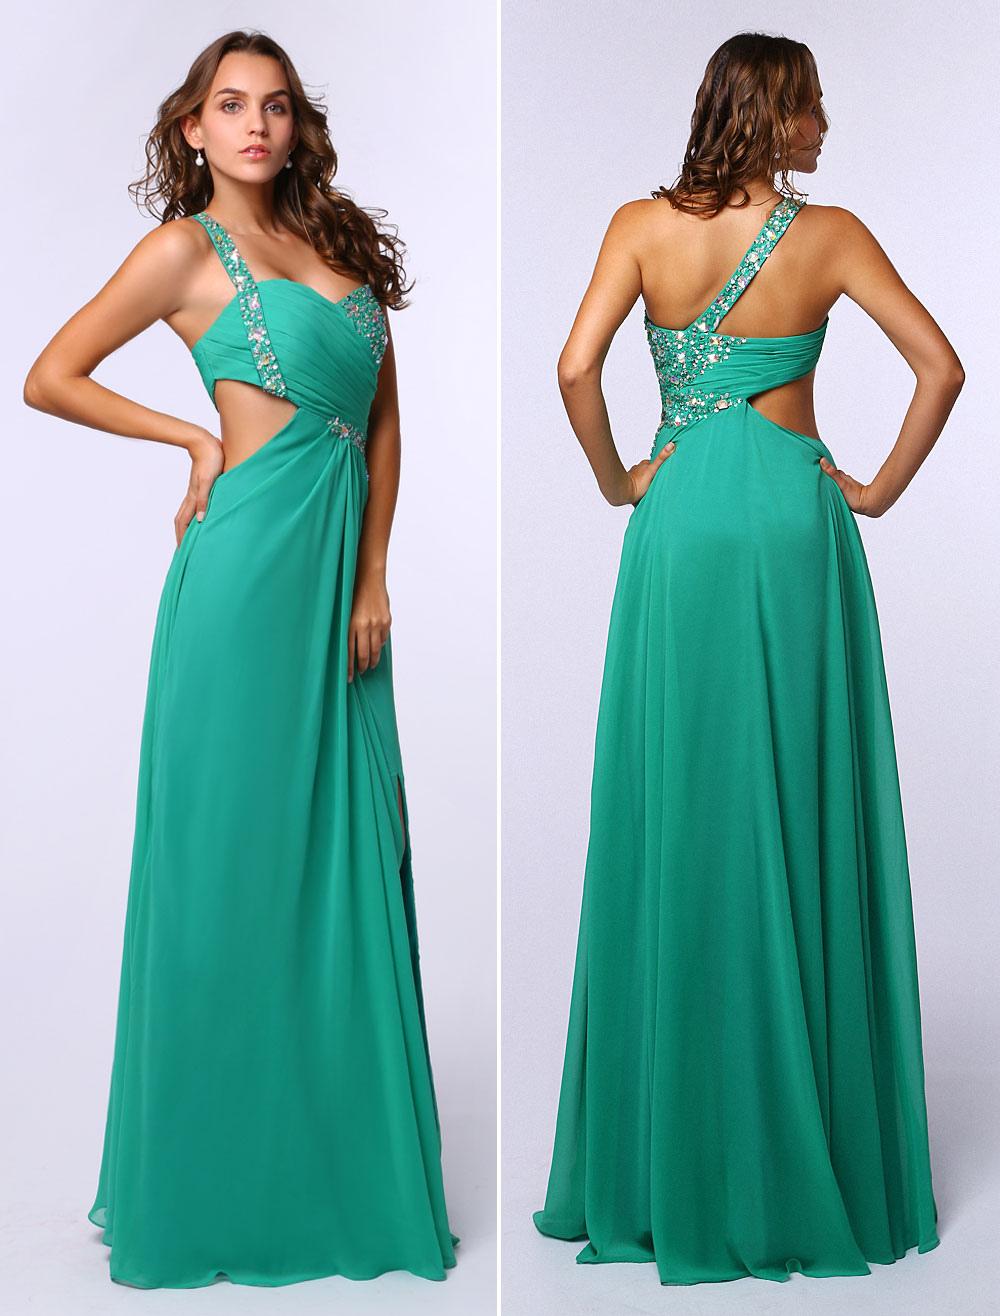 Blue Green Prom Dress Straps Chiffon Party Dress A Line Sleeveless One-Shoulder (Wedding Prom Dresses) photo